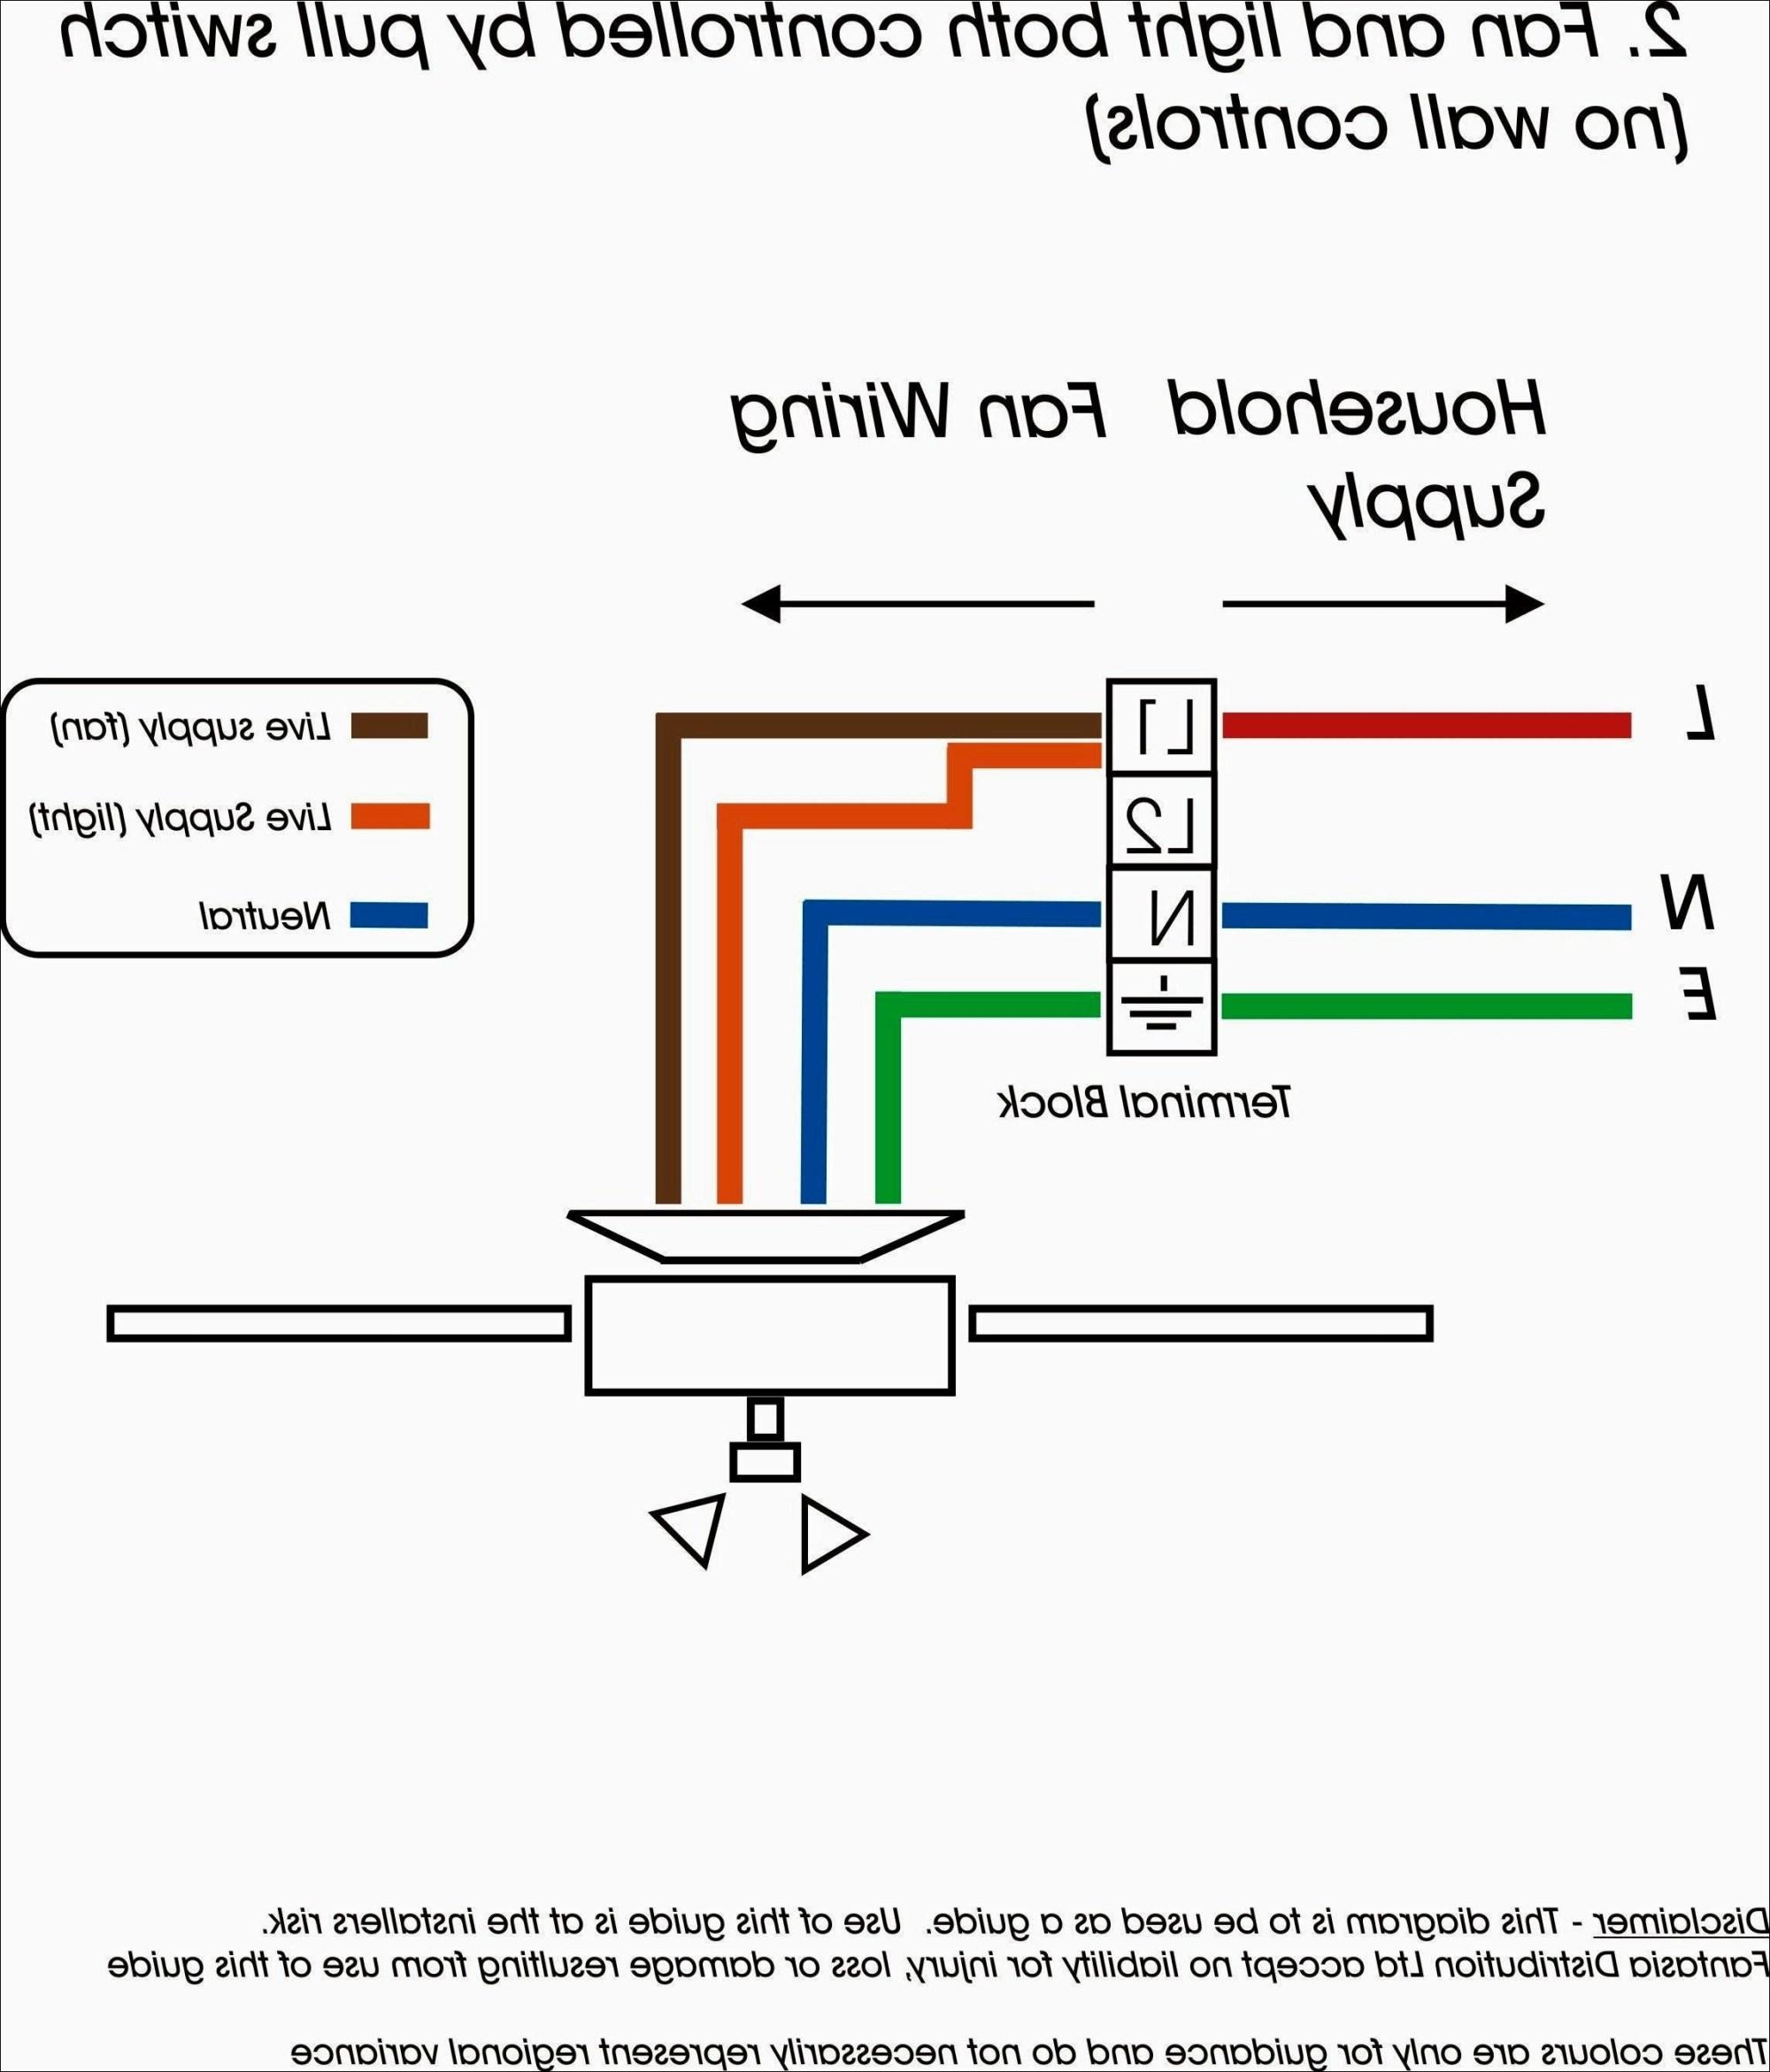 hight resolution of gx390 wiring diagram wiring library gx390 parts diagram honda gx390 wiring